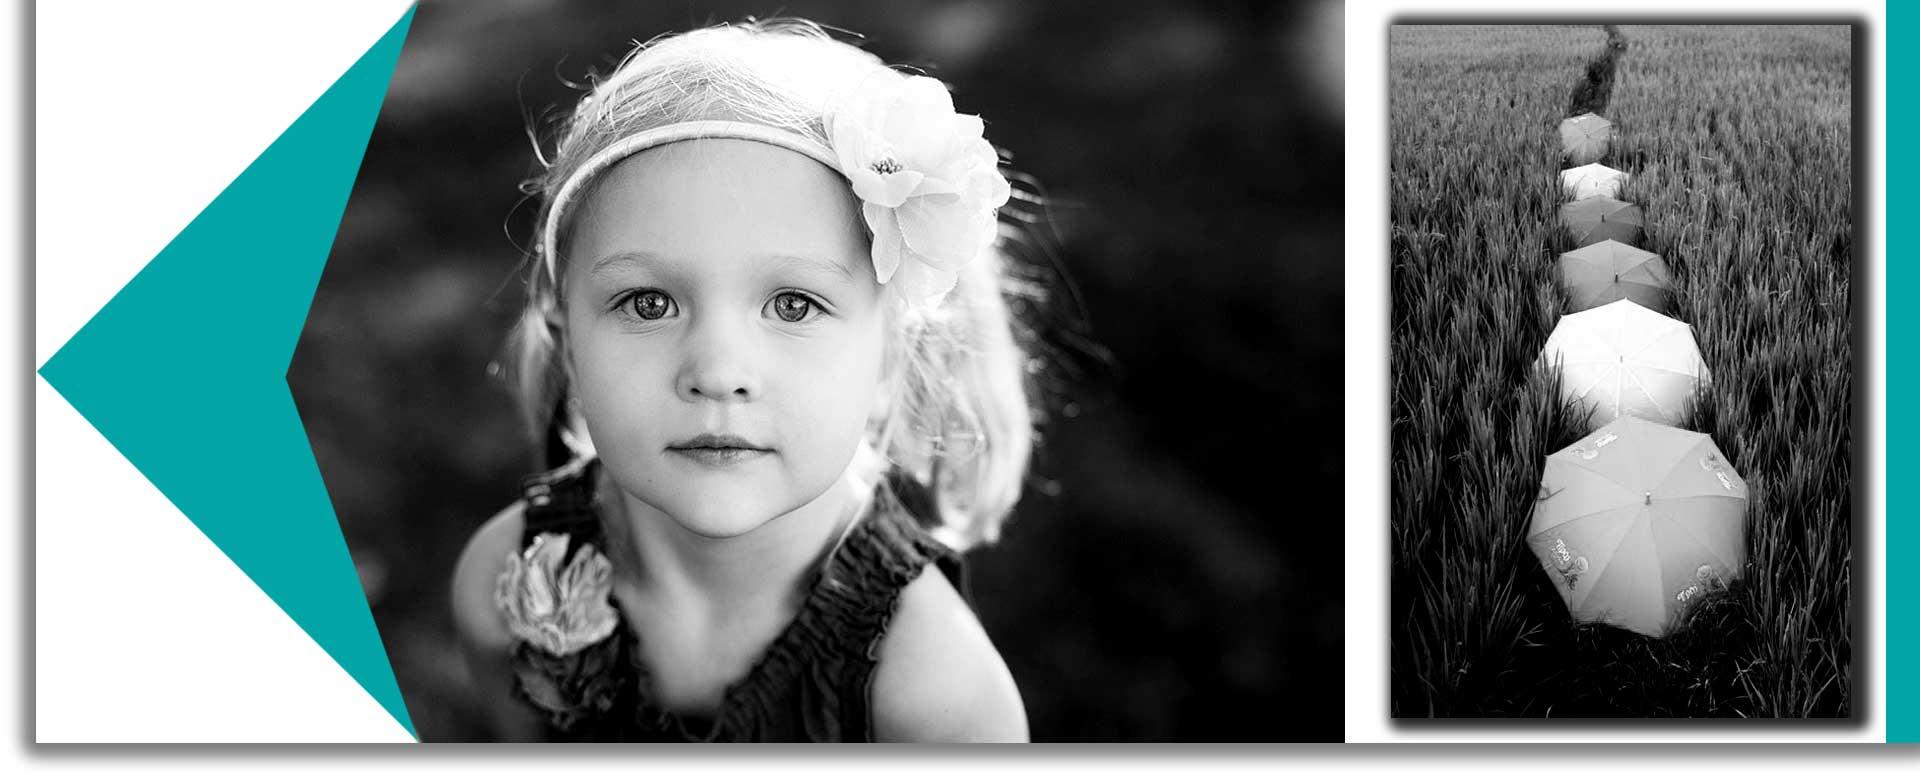 f Stunning Black and Whites 4 - ویژگی عکس های سیاه و سفید کدامند و چگونه میتوان به آنها دست یافت ؟